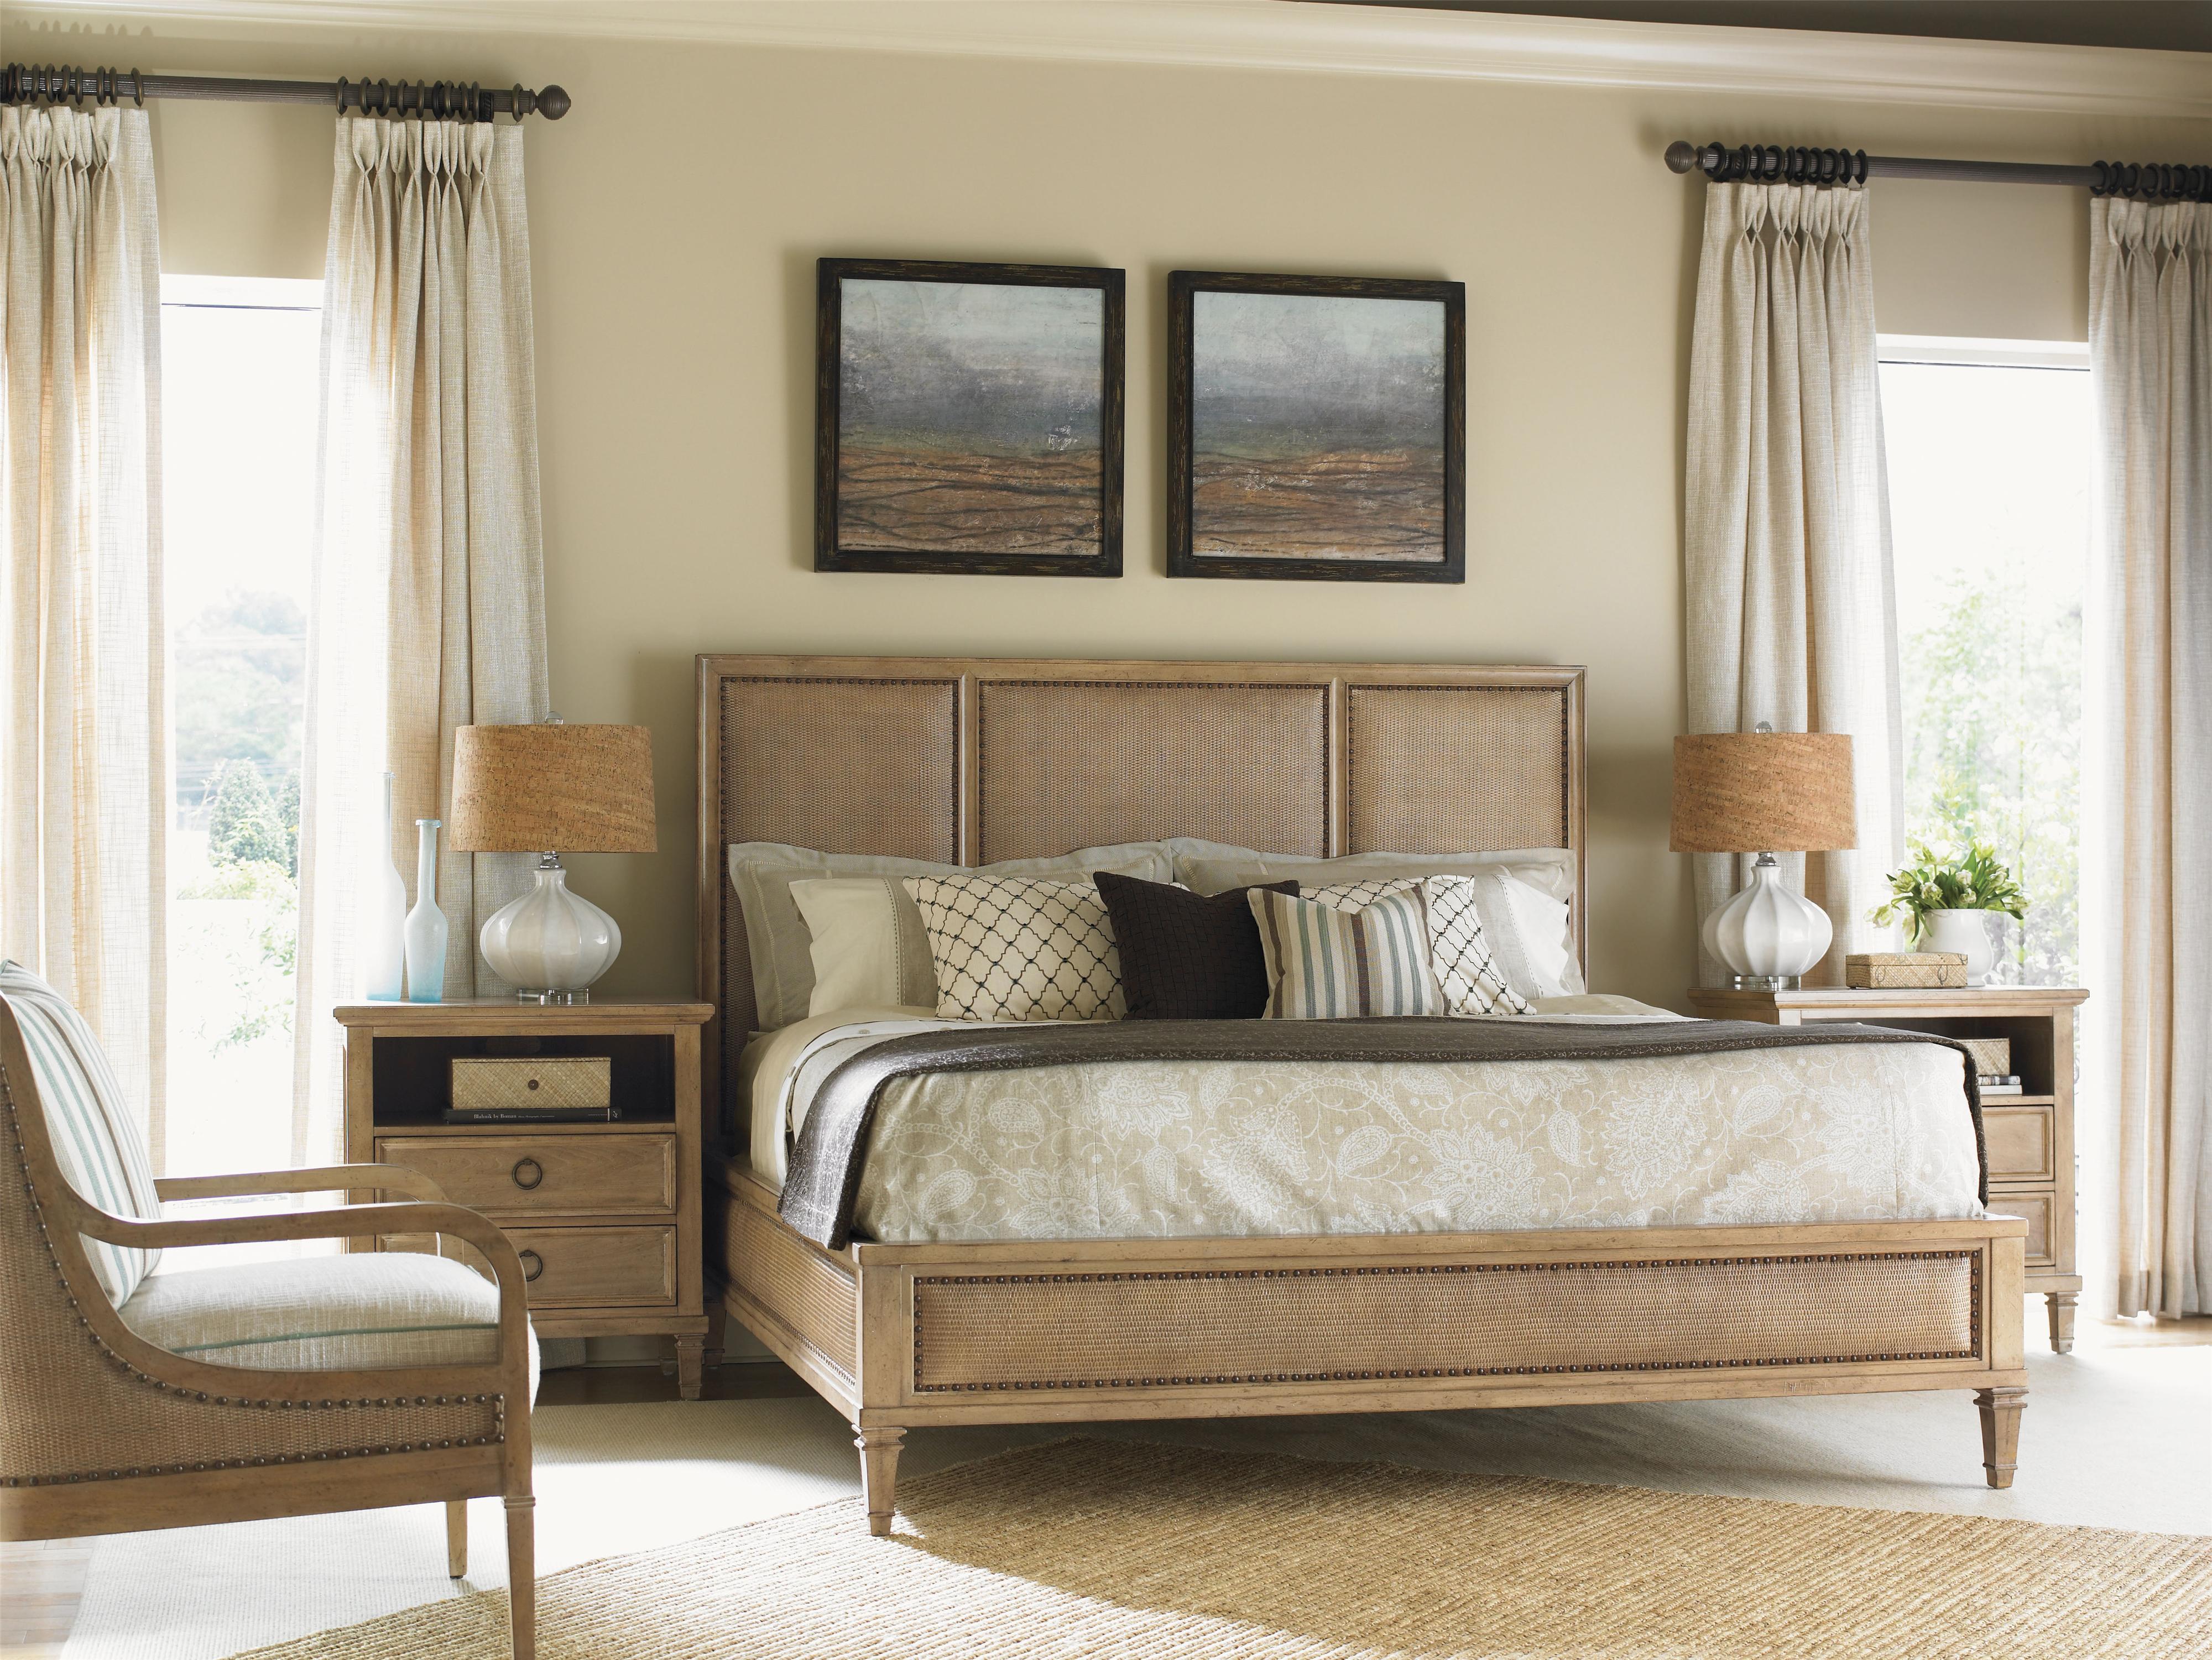 Monterey Sands (830) By Lexington   Baeru0027s Furniture   Lexington Monterey  Sands Dealer